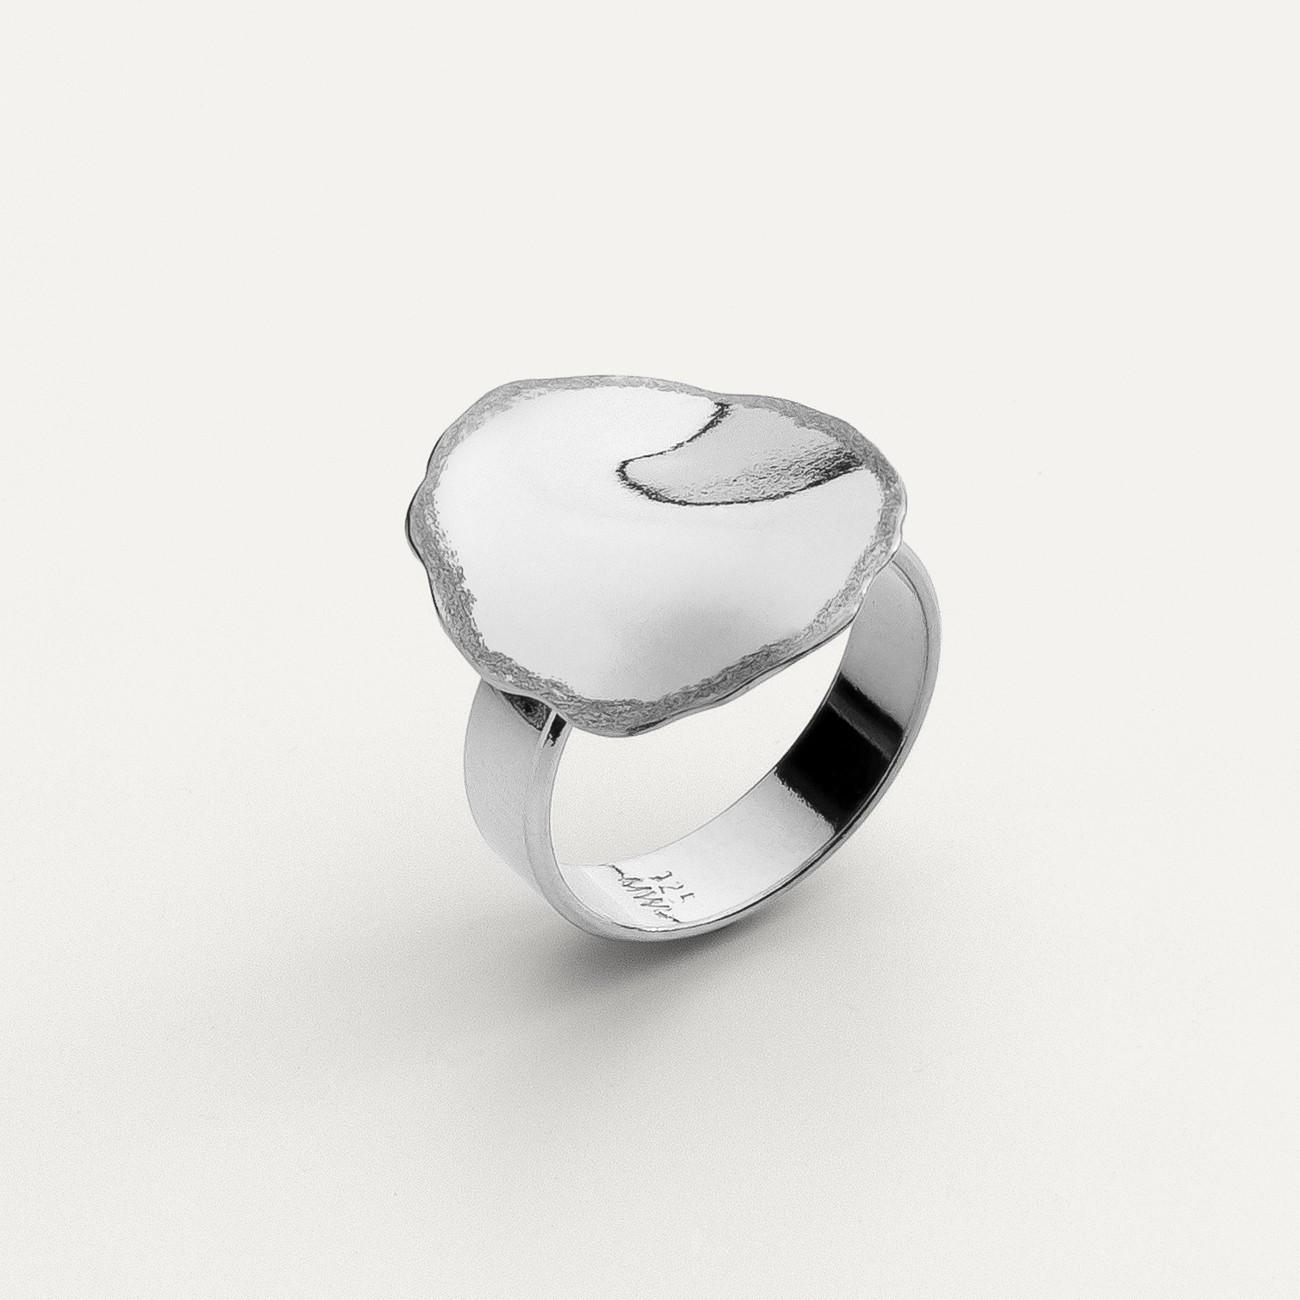 Pierścionek z gniecioną blachą, srebro 925